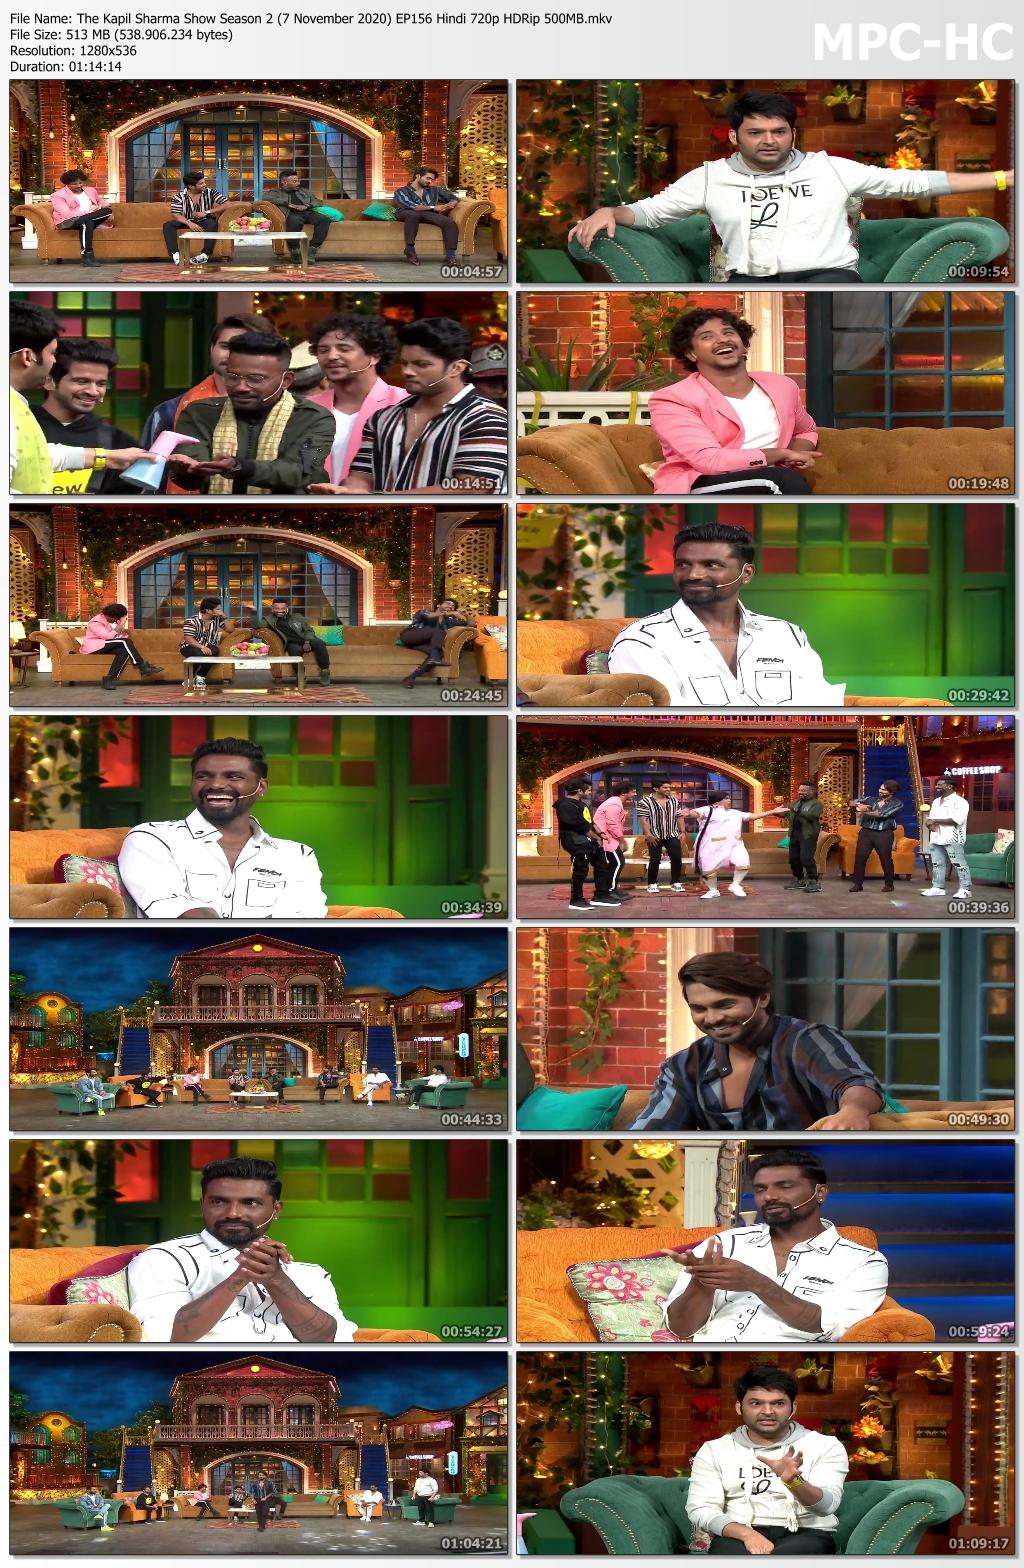 The-Kapil-Sharma-Show-Season-2-7-November-2020-EP156-Hindi-720p-HDRip-500-MB-mkv-thumbs